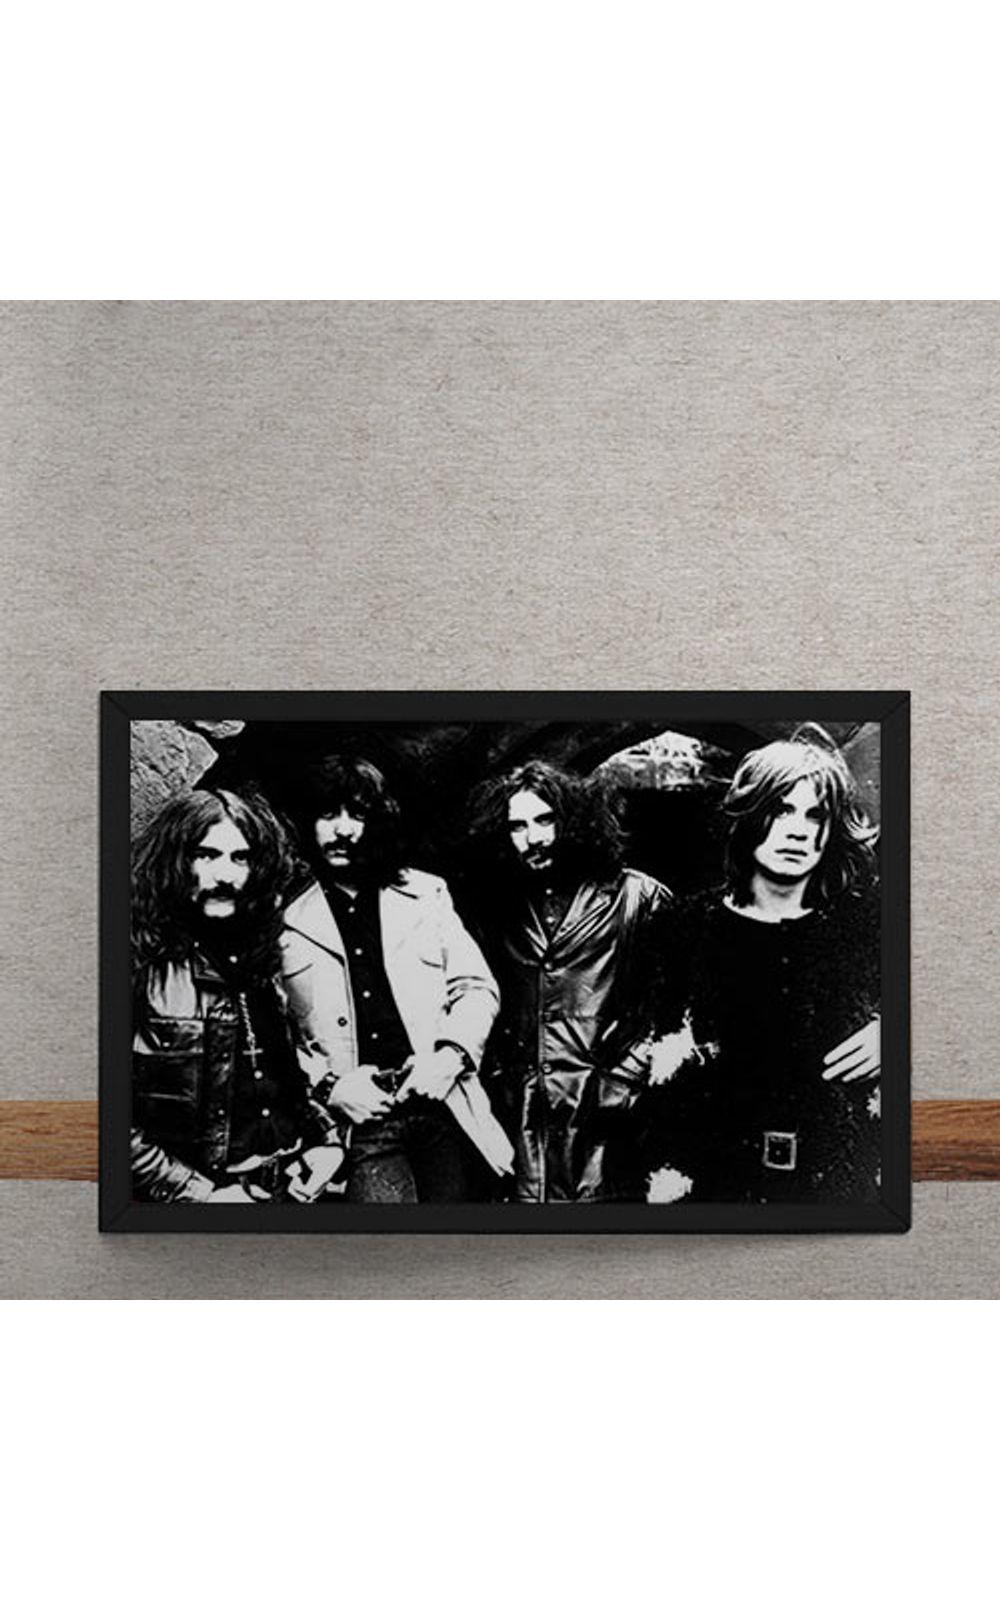 Foto 3 - Quadro Decorativo Black Sabbath Fotografia Antiga